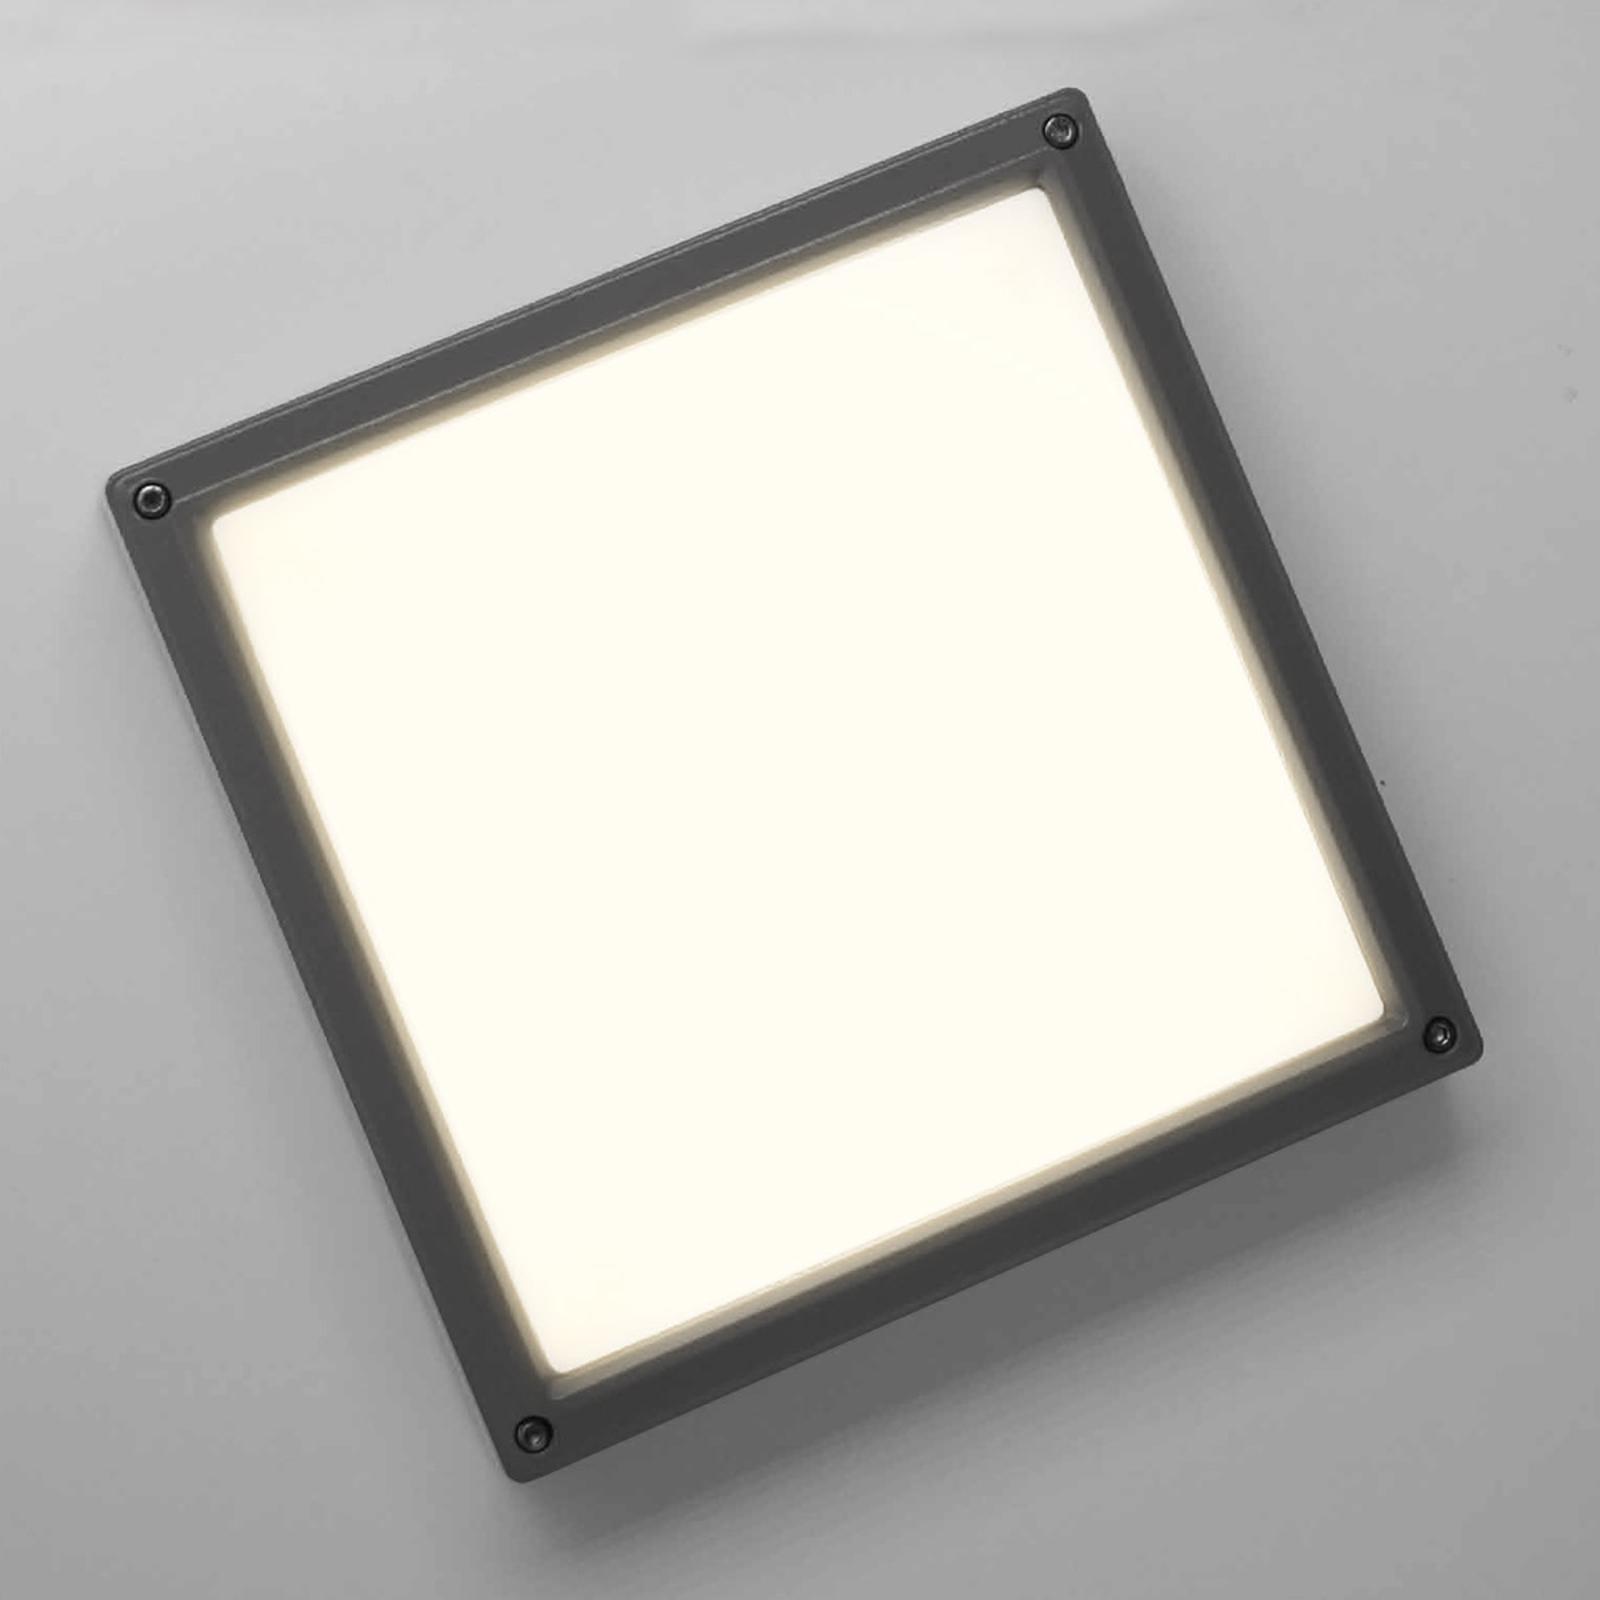 Lampa ścienna LED SUN 11 13W, antracyt 3K